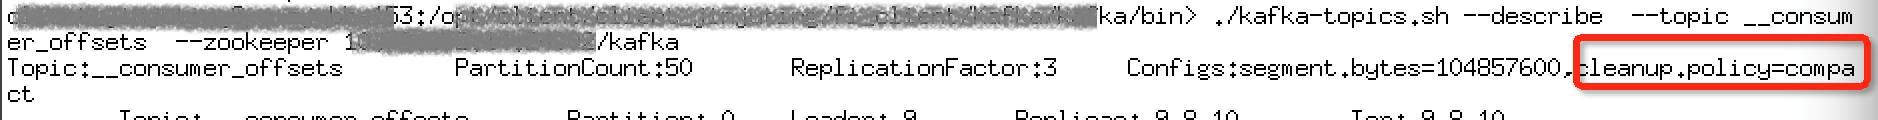 Kafka集群磁盘使用率瞬超85%,幕后元凶竟是它?插图(6)